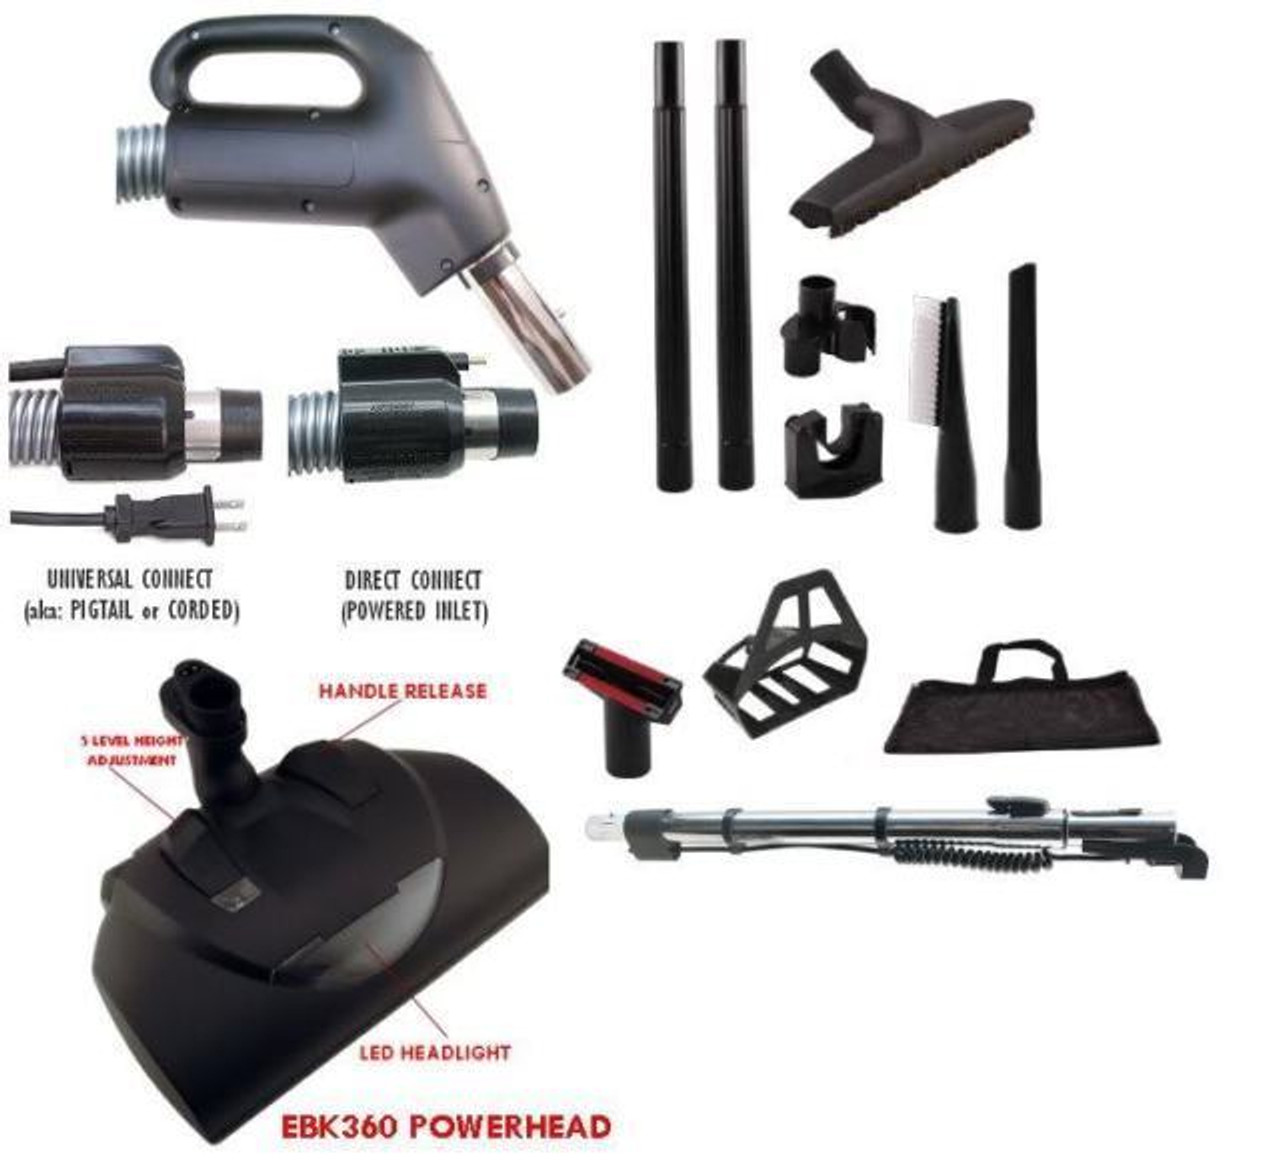 Central Vacuum Accessory Set